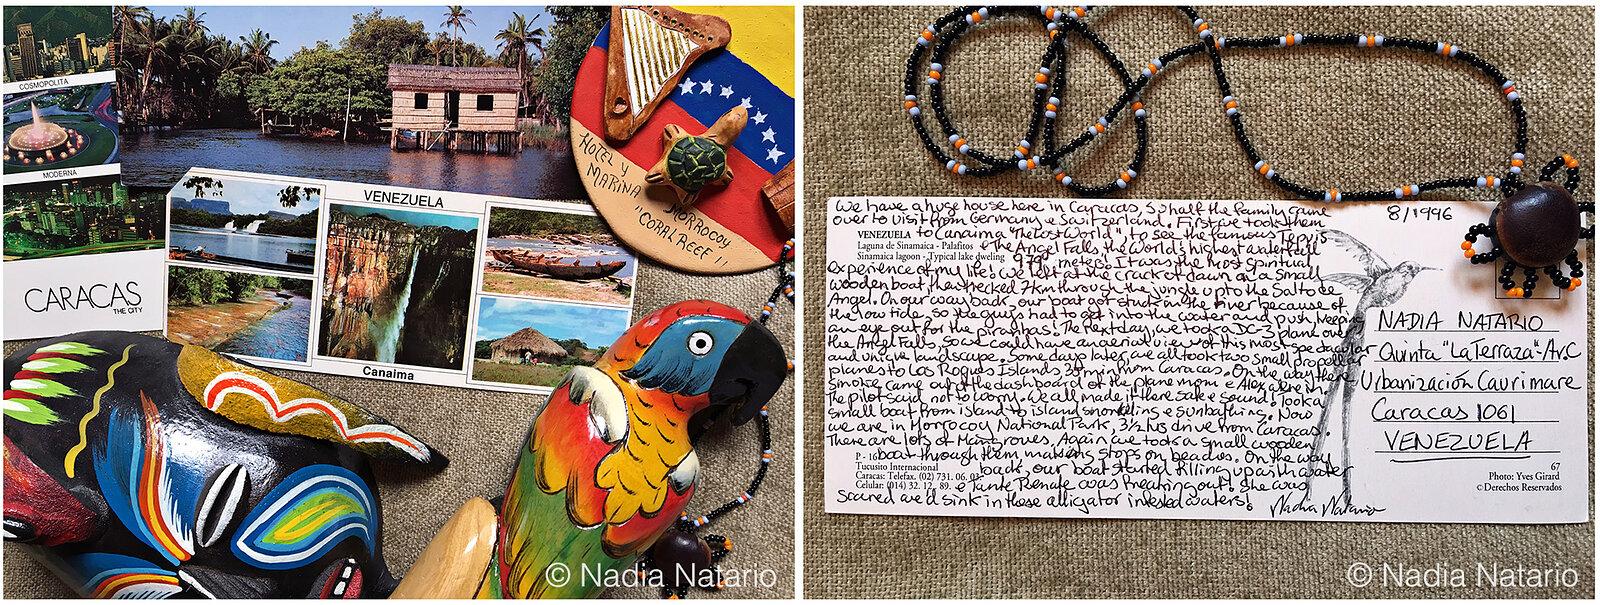 Postcards to Myself - Canaima, Venezuela 1996